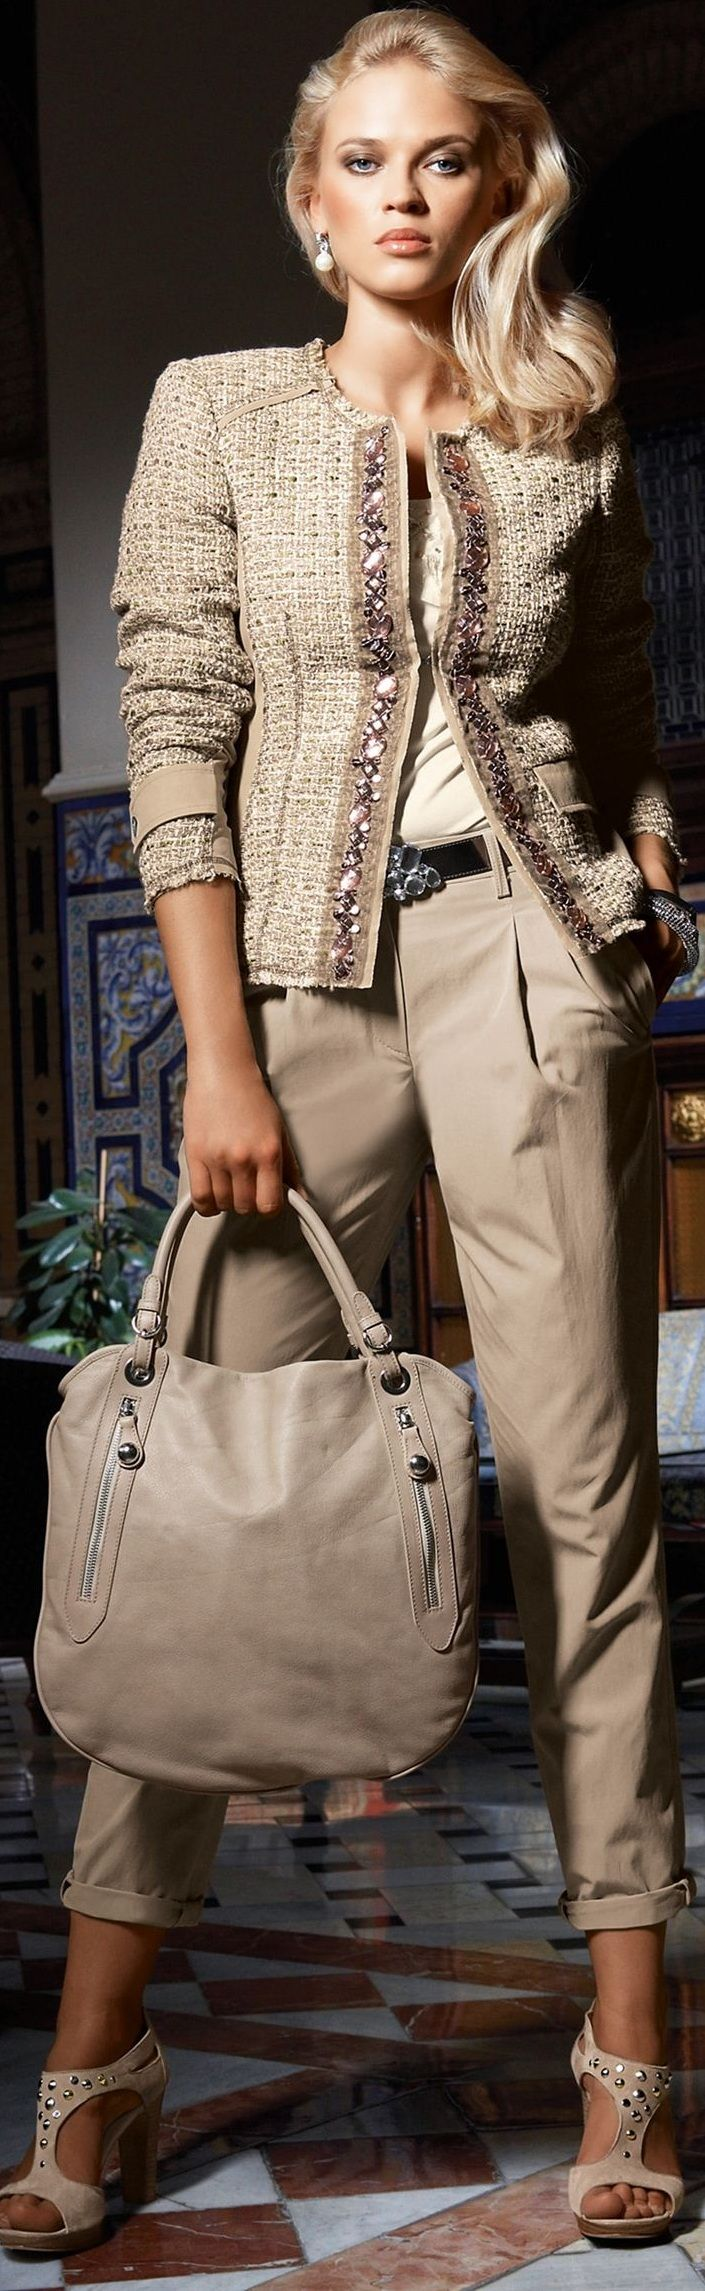 style ♥✤ | Keep the Glamour | BeStayBeautiful